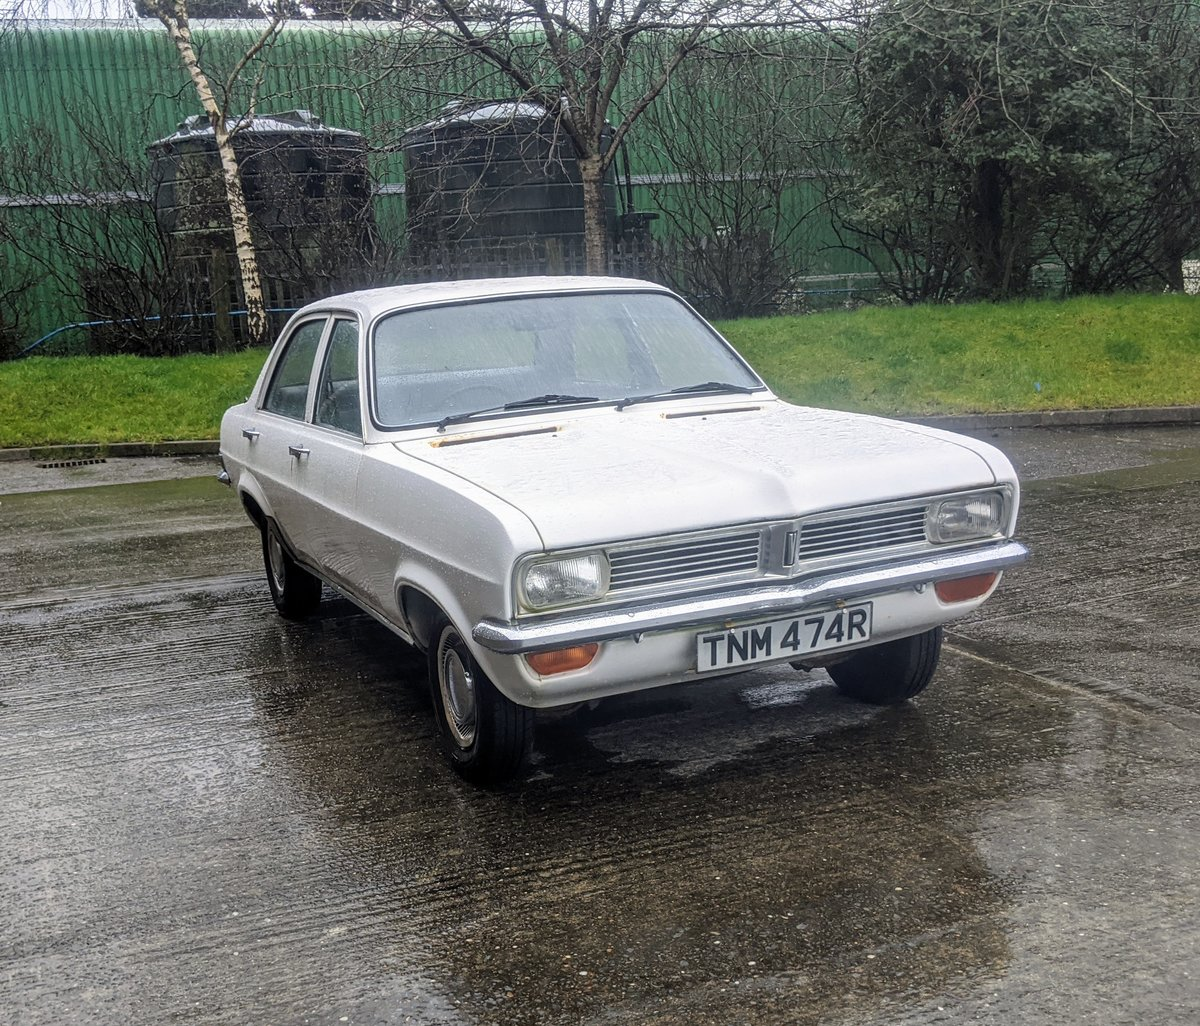 1977 Vauxhall Viva Hc For Sale